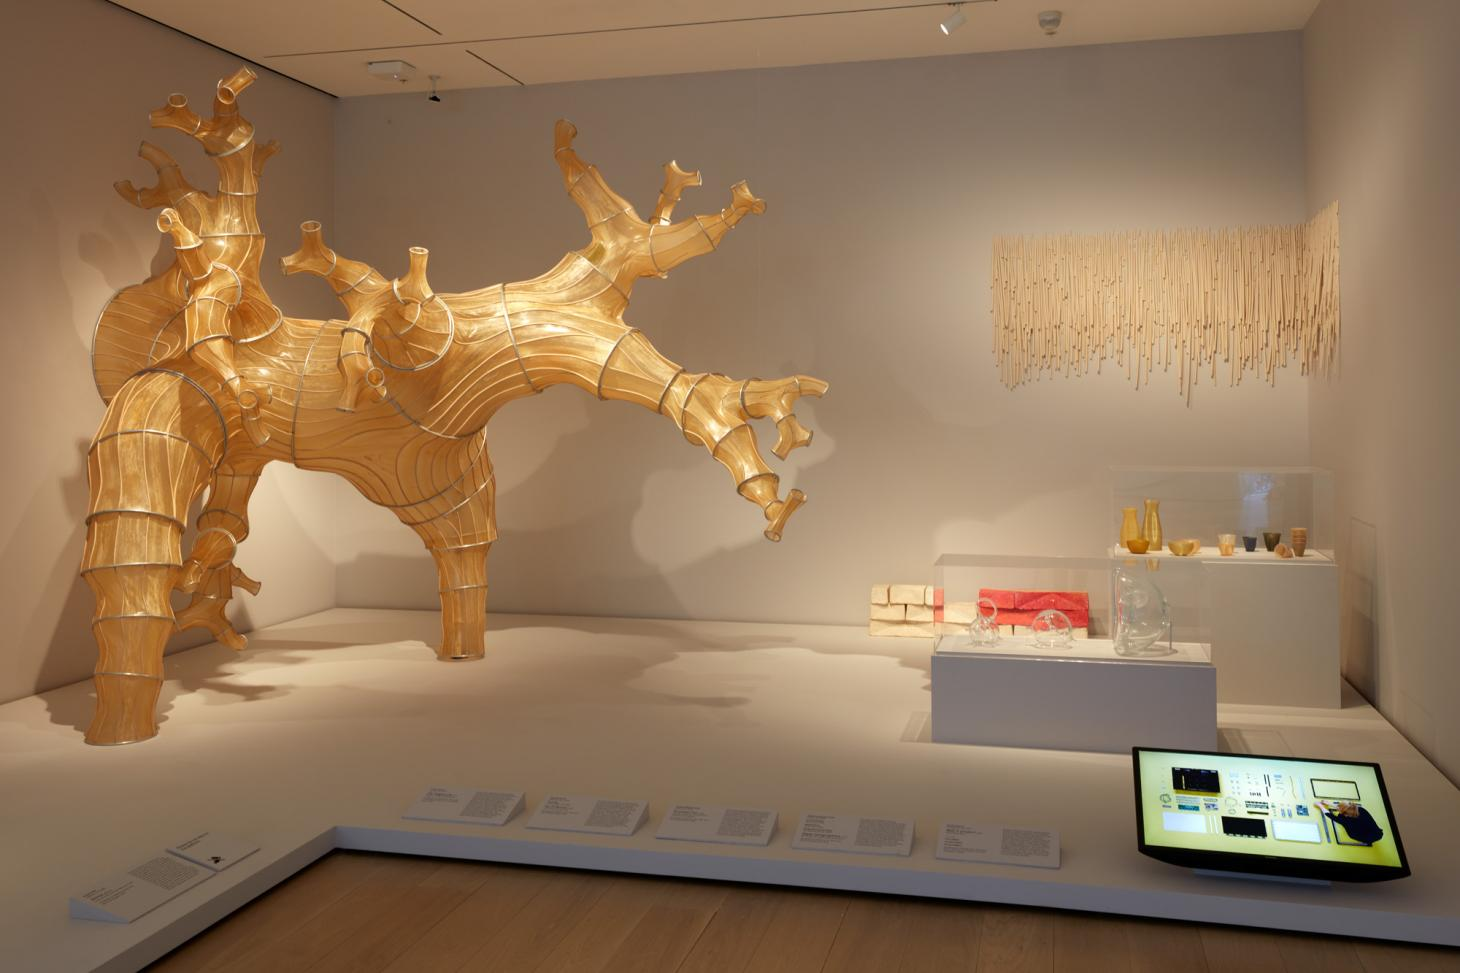 Paola Antonelli的《破碎的自然》获得*设计奖*